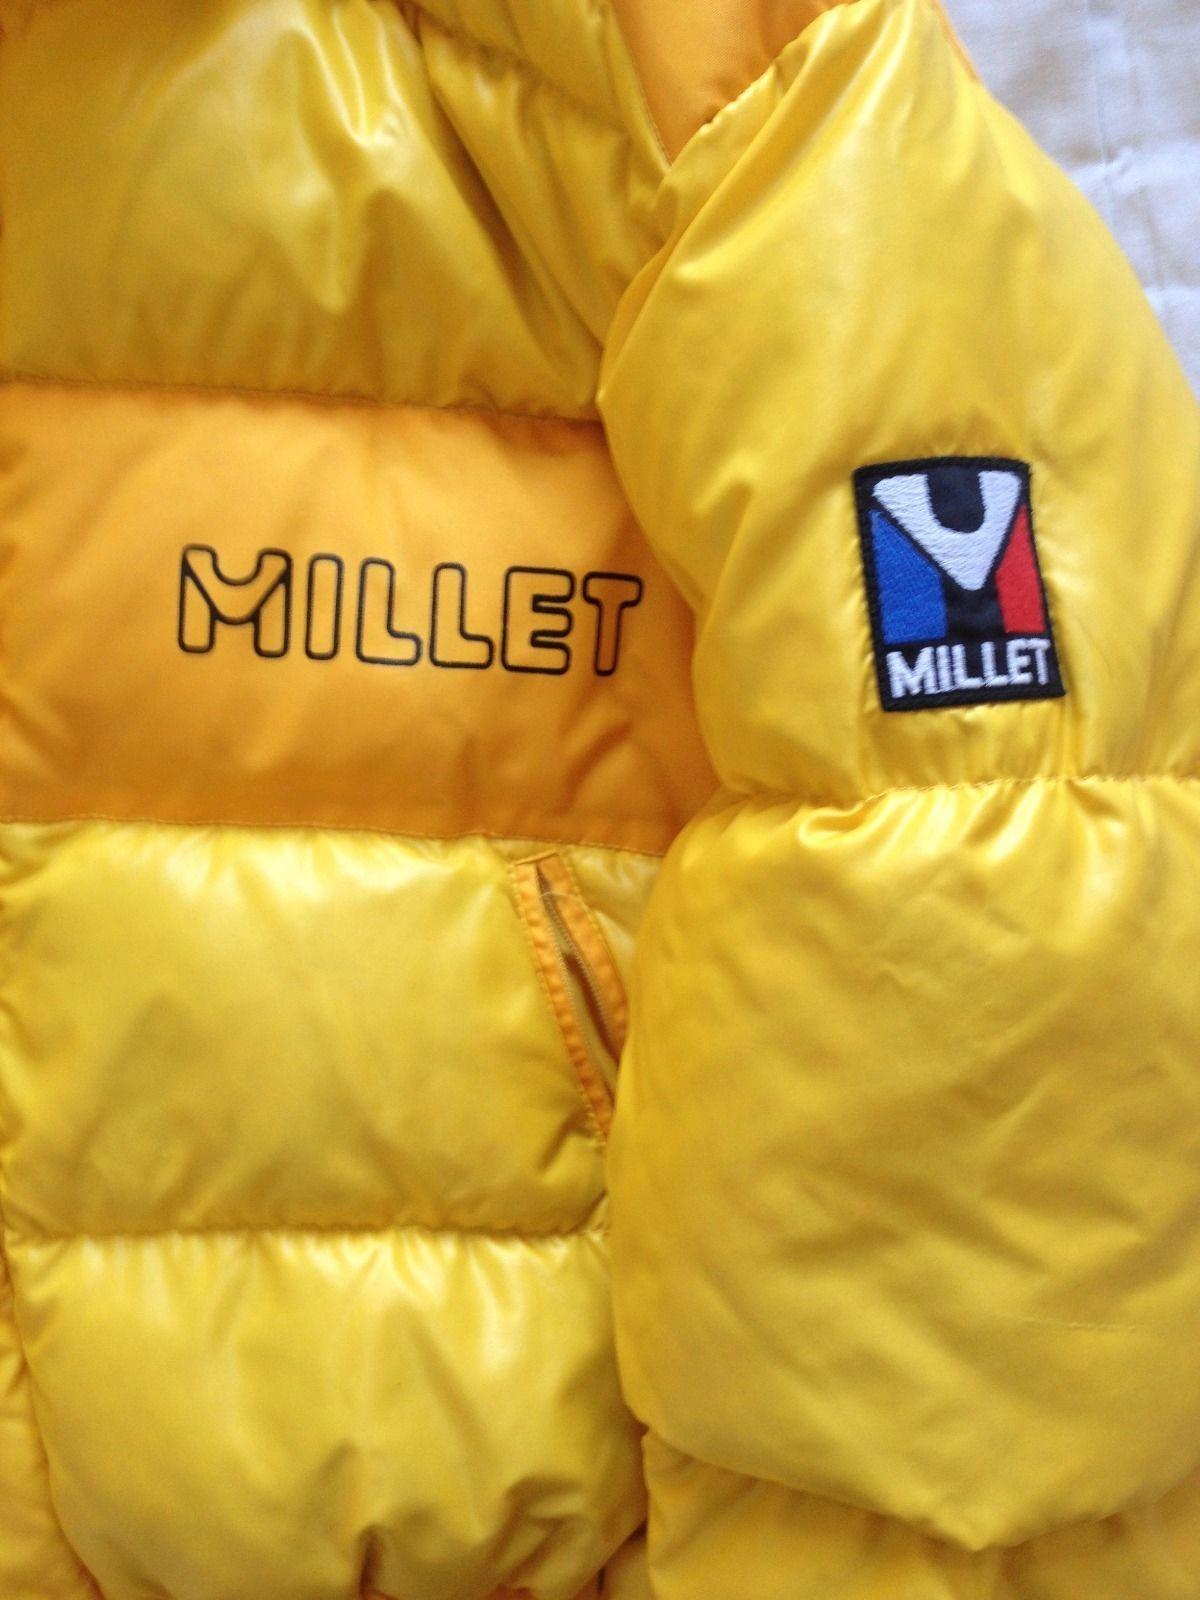 2fdc8a84dddd Vintage Millet doudoune down jacket size 3 (medium)